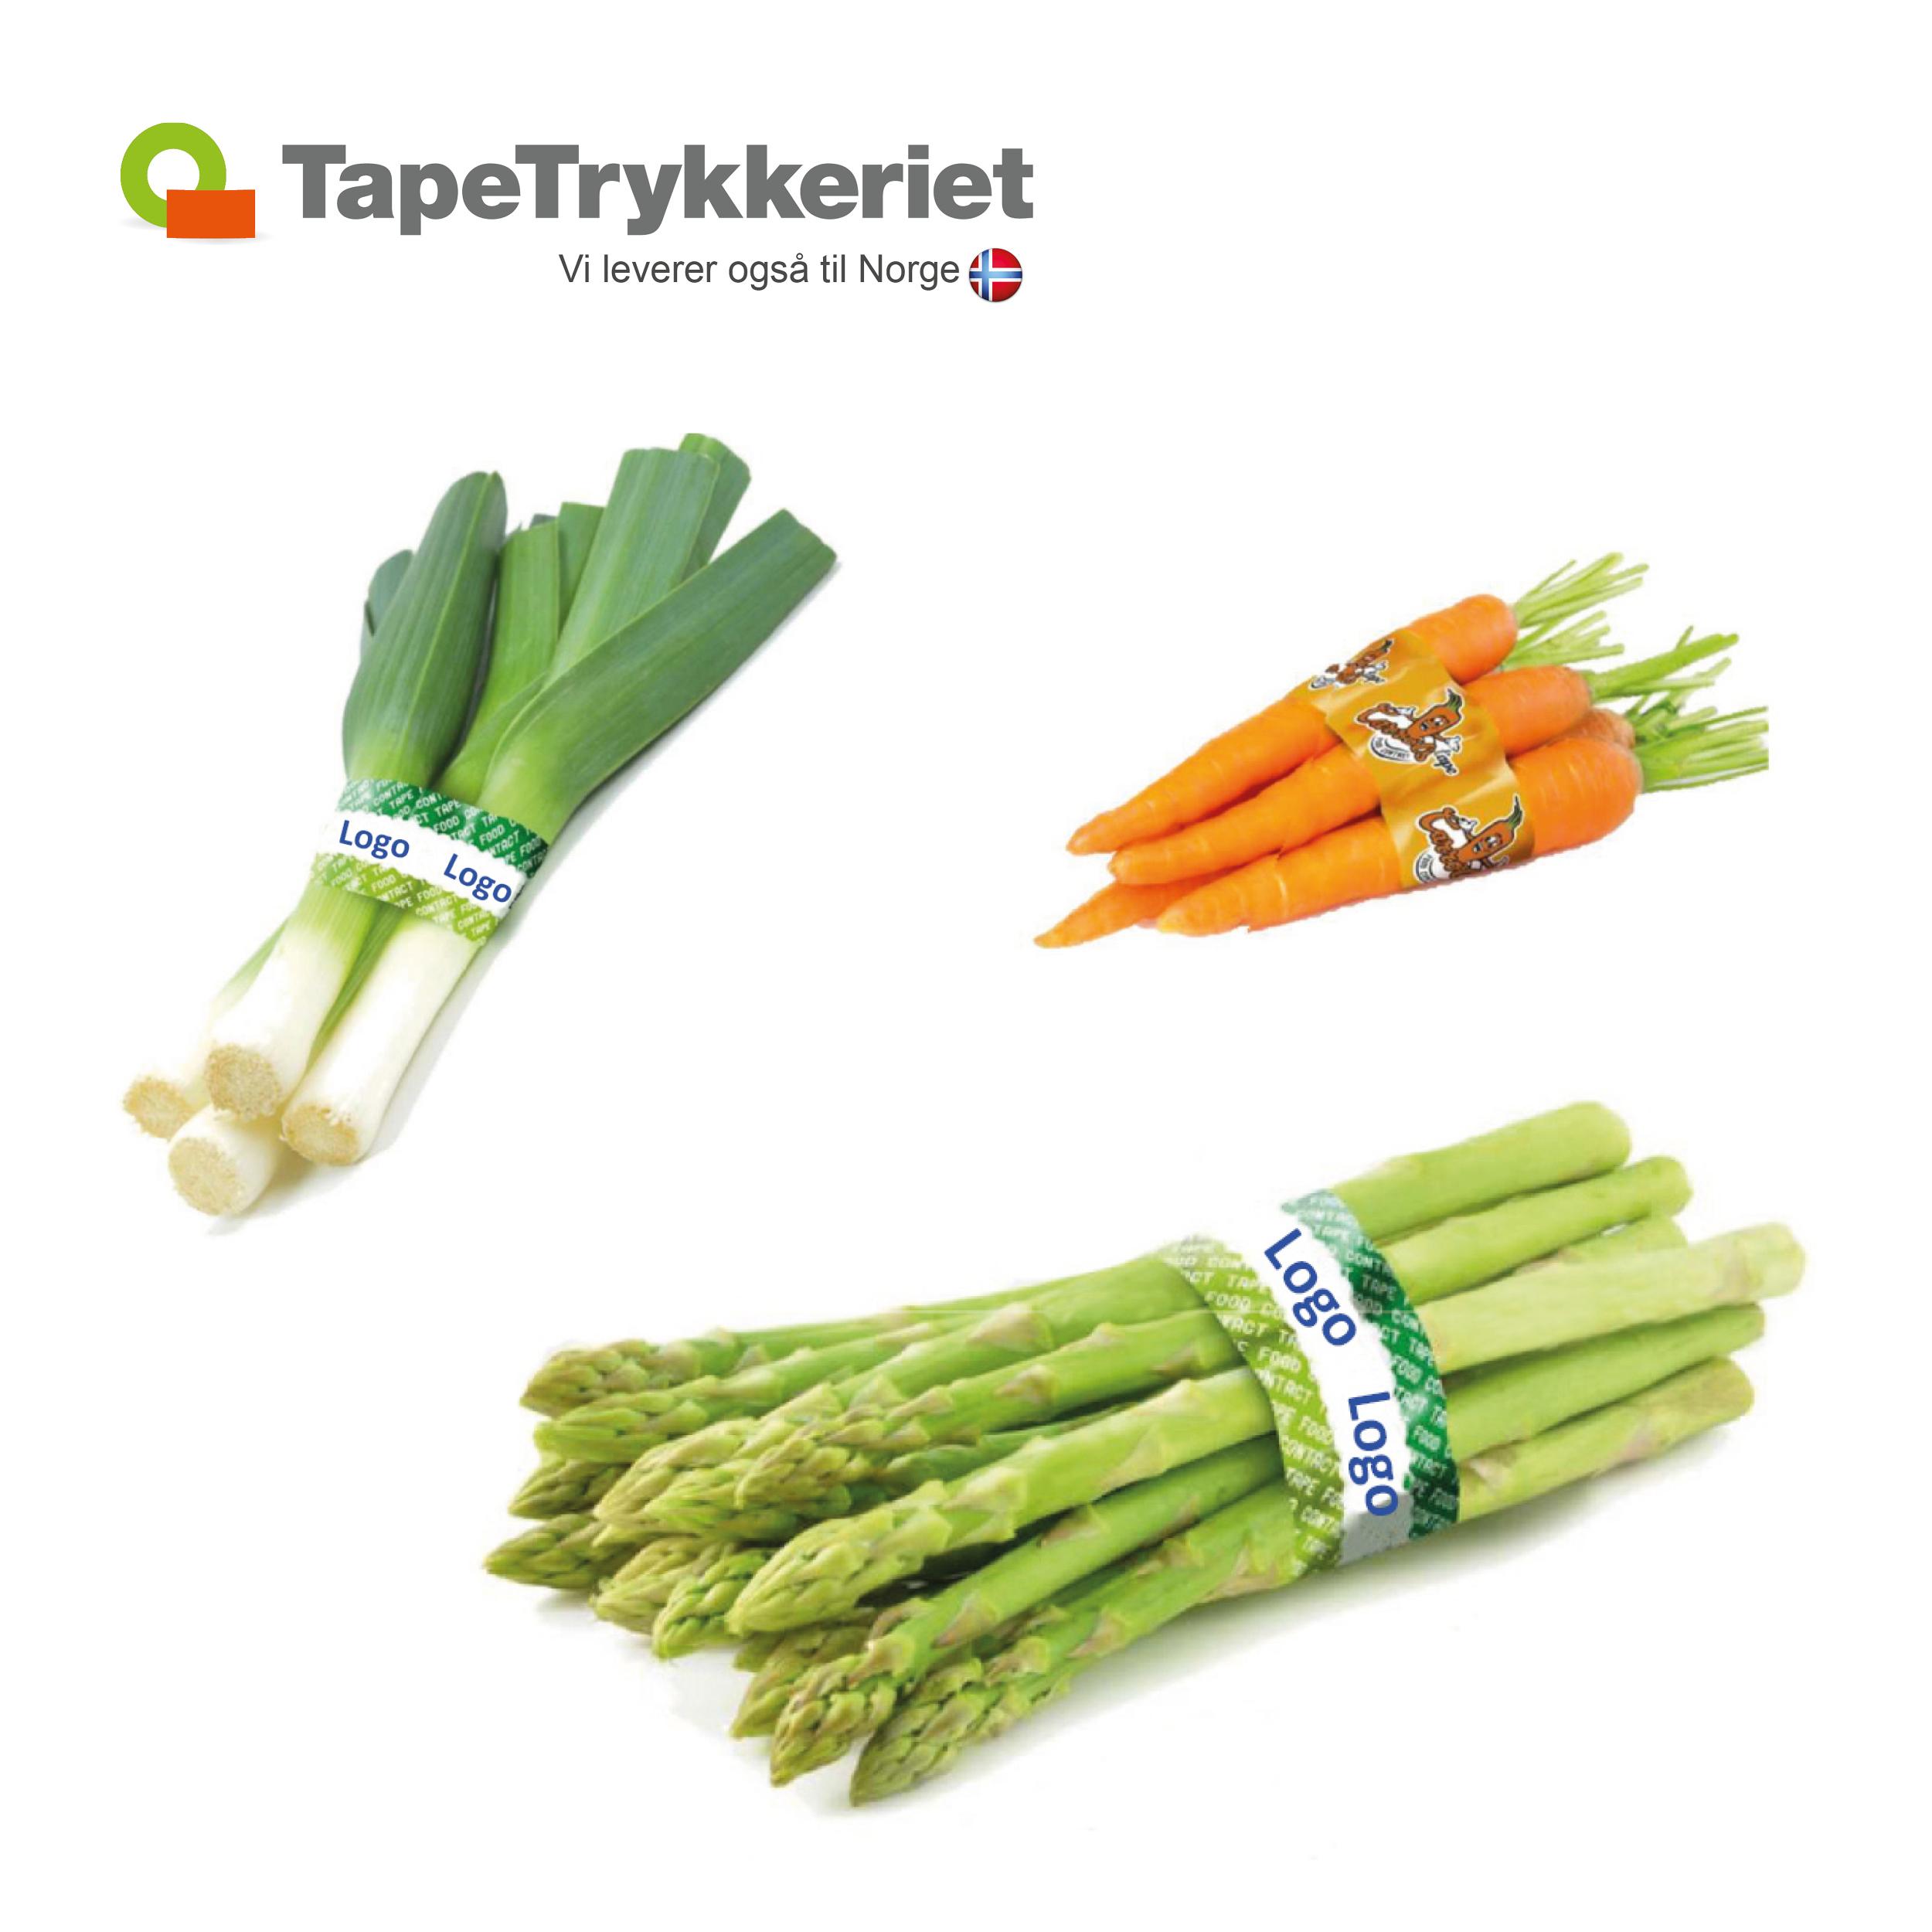 Tape til kontakt med fødevarer, TapeTrykkeriet.dk